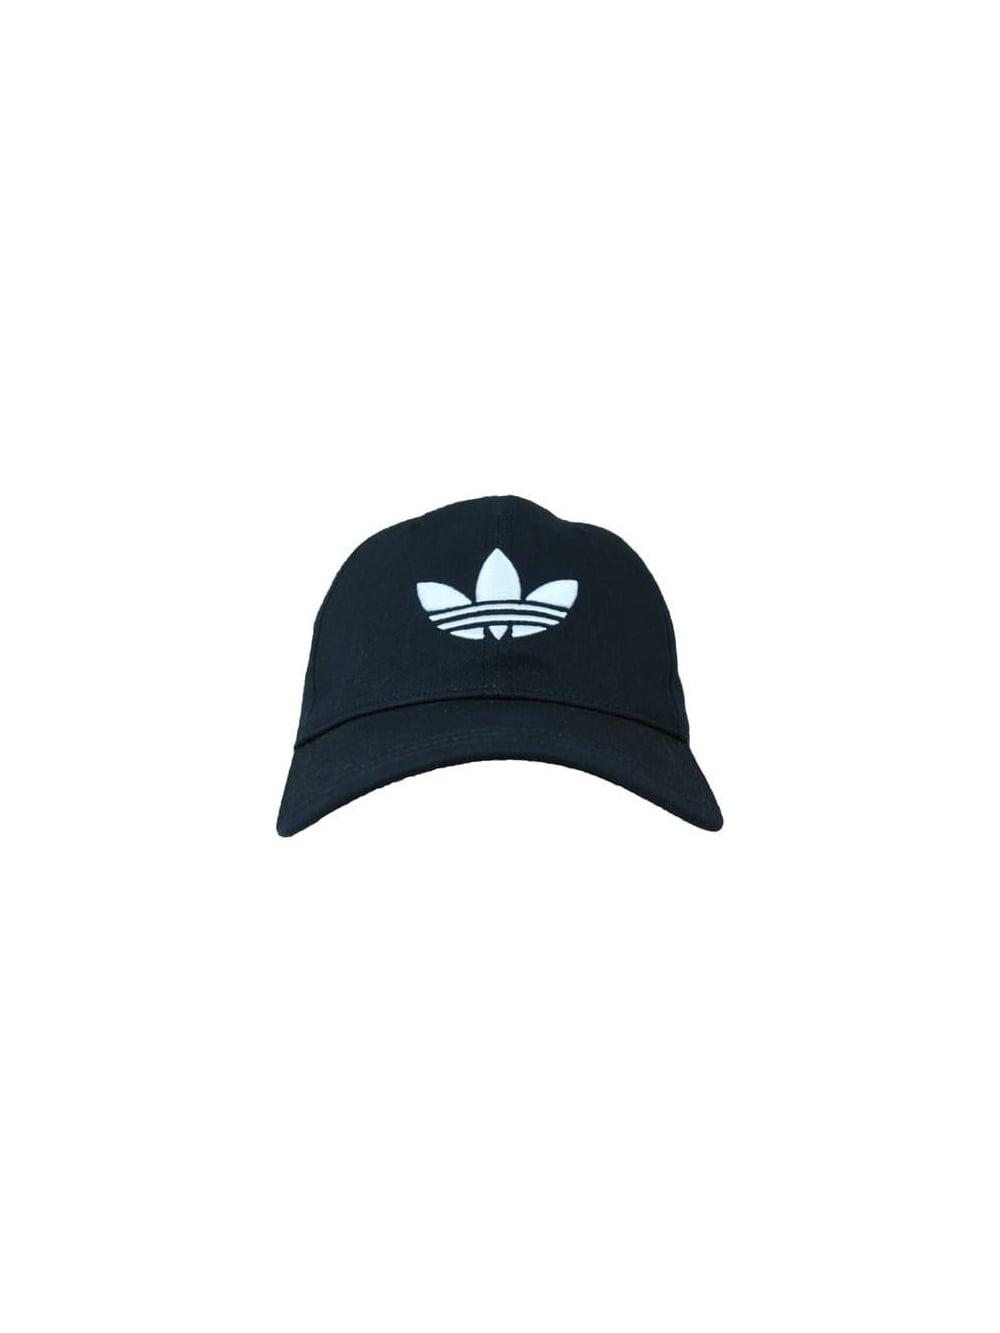 2878065cdbeb adidas Originals Trefoil Cap in Black - Northern Threads